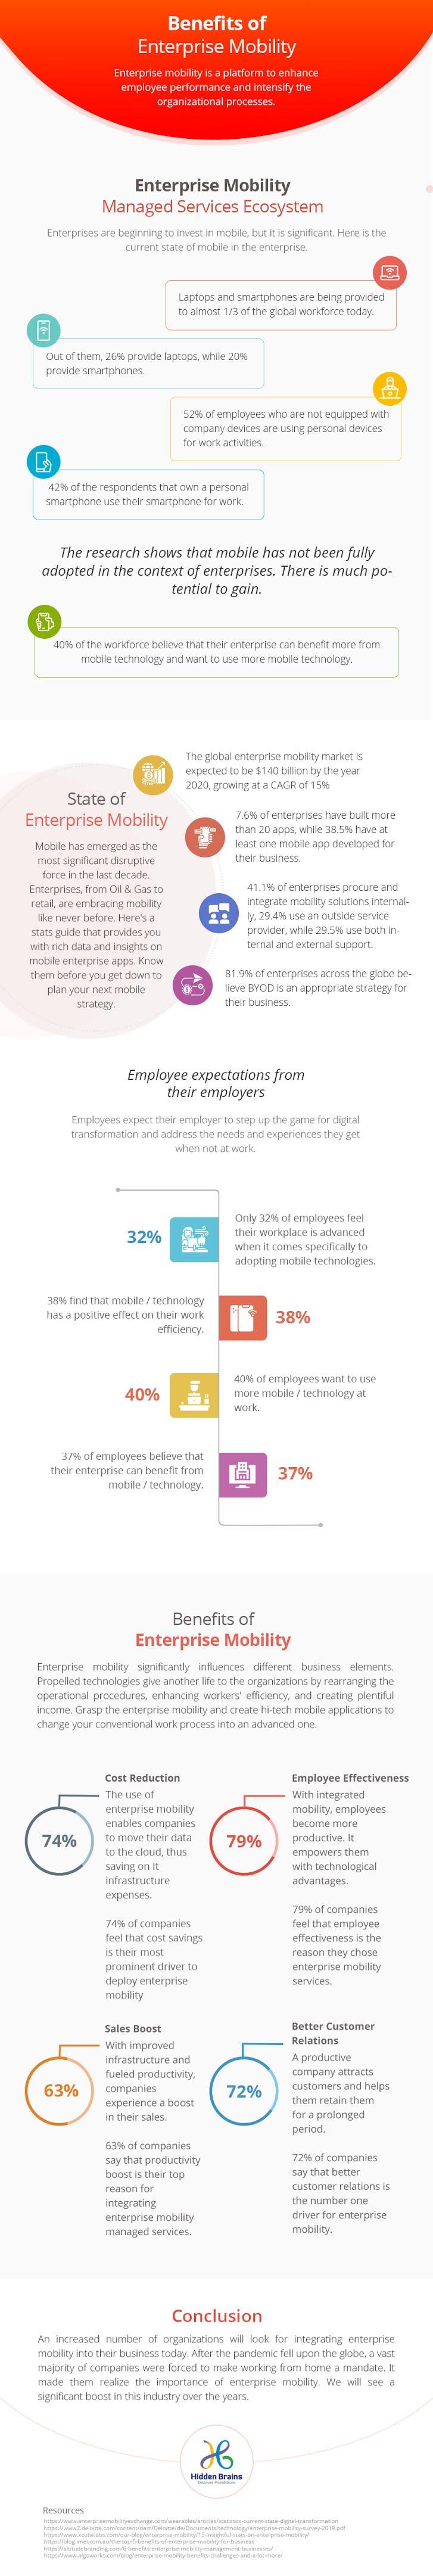 Benefits of Enterprise Mobility